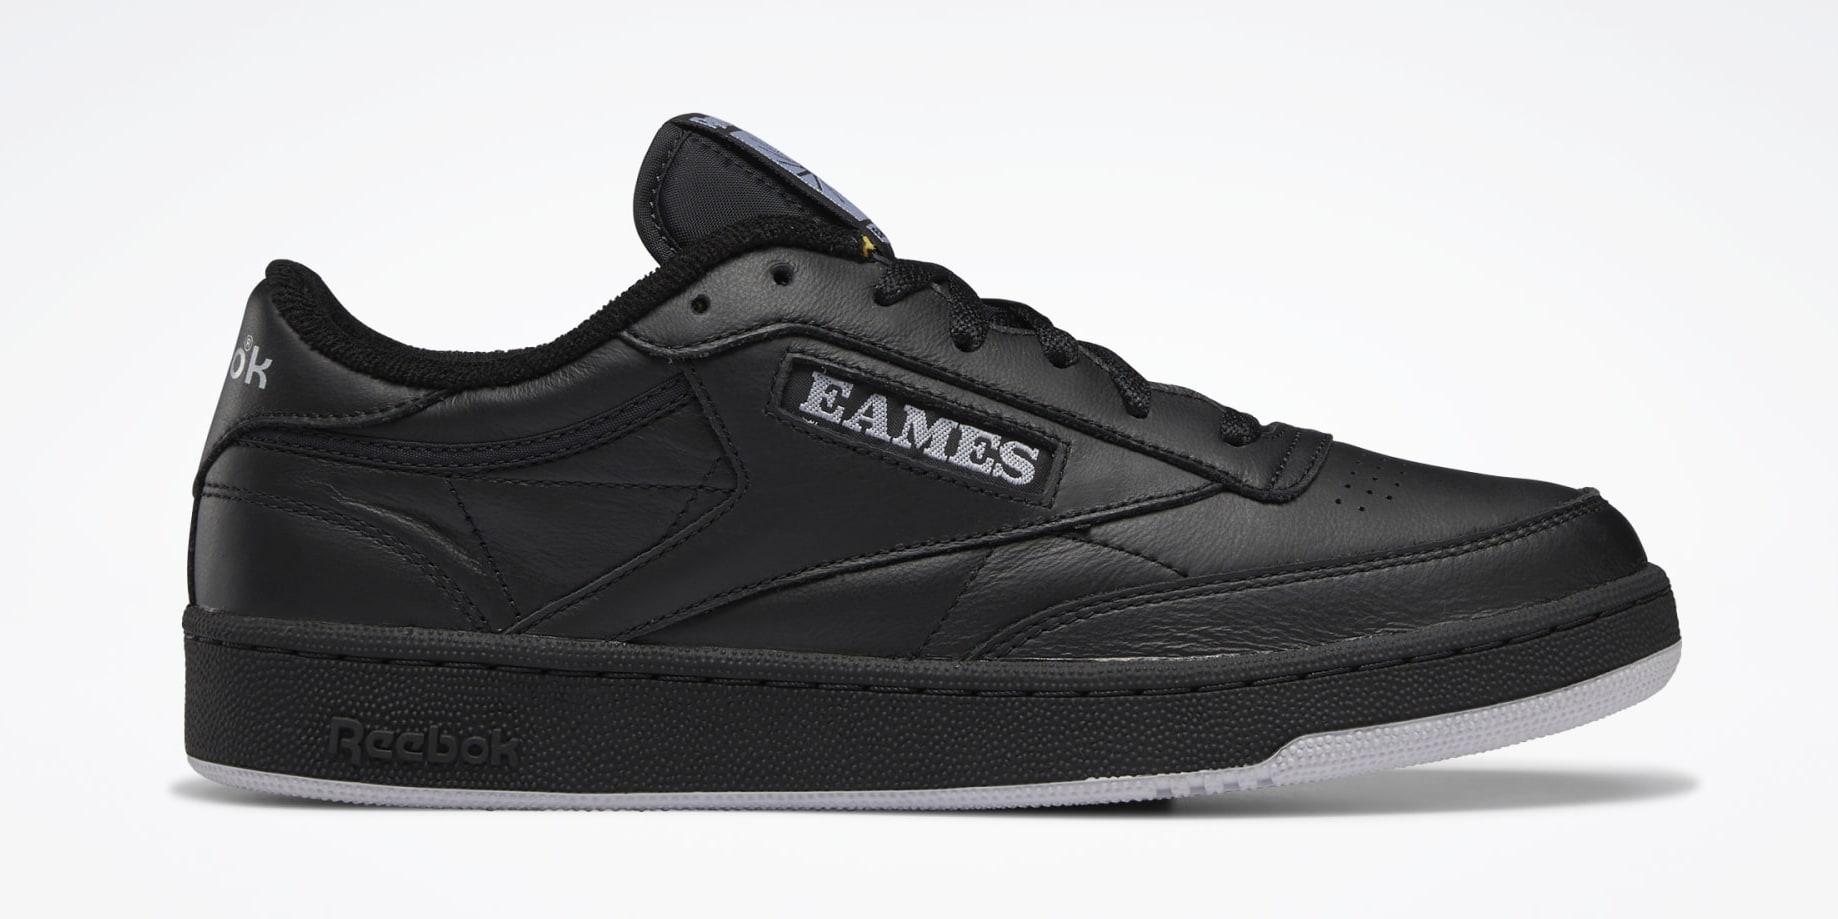 Eames x Reebok Club C Black GY1067 Lateral